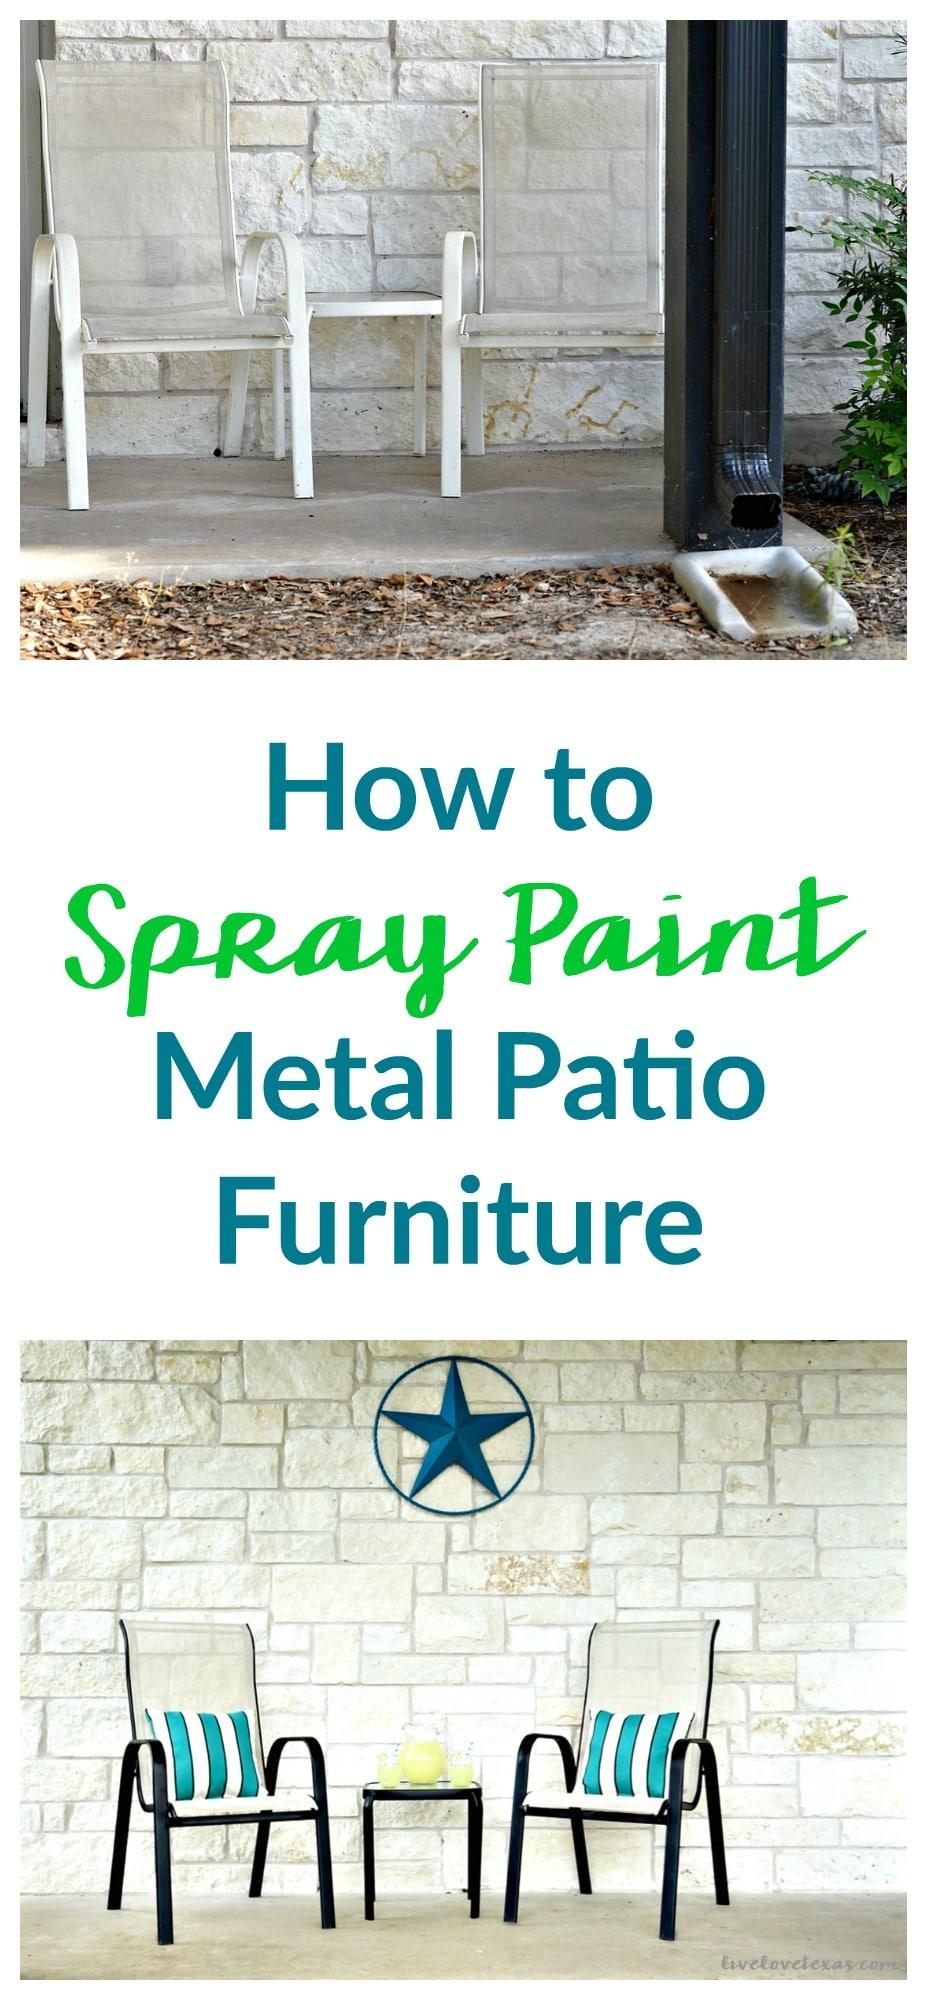 How To Spray Paint Metal Patio Furniture: spray painting metal patio furniture